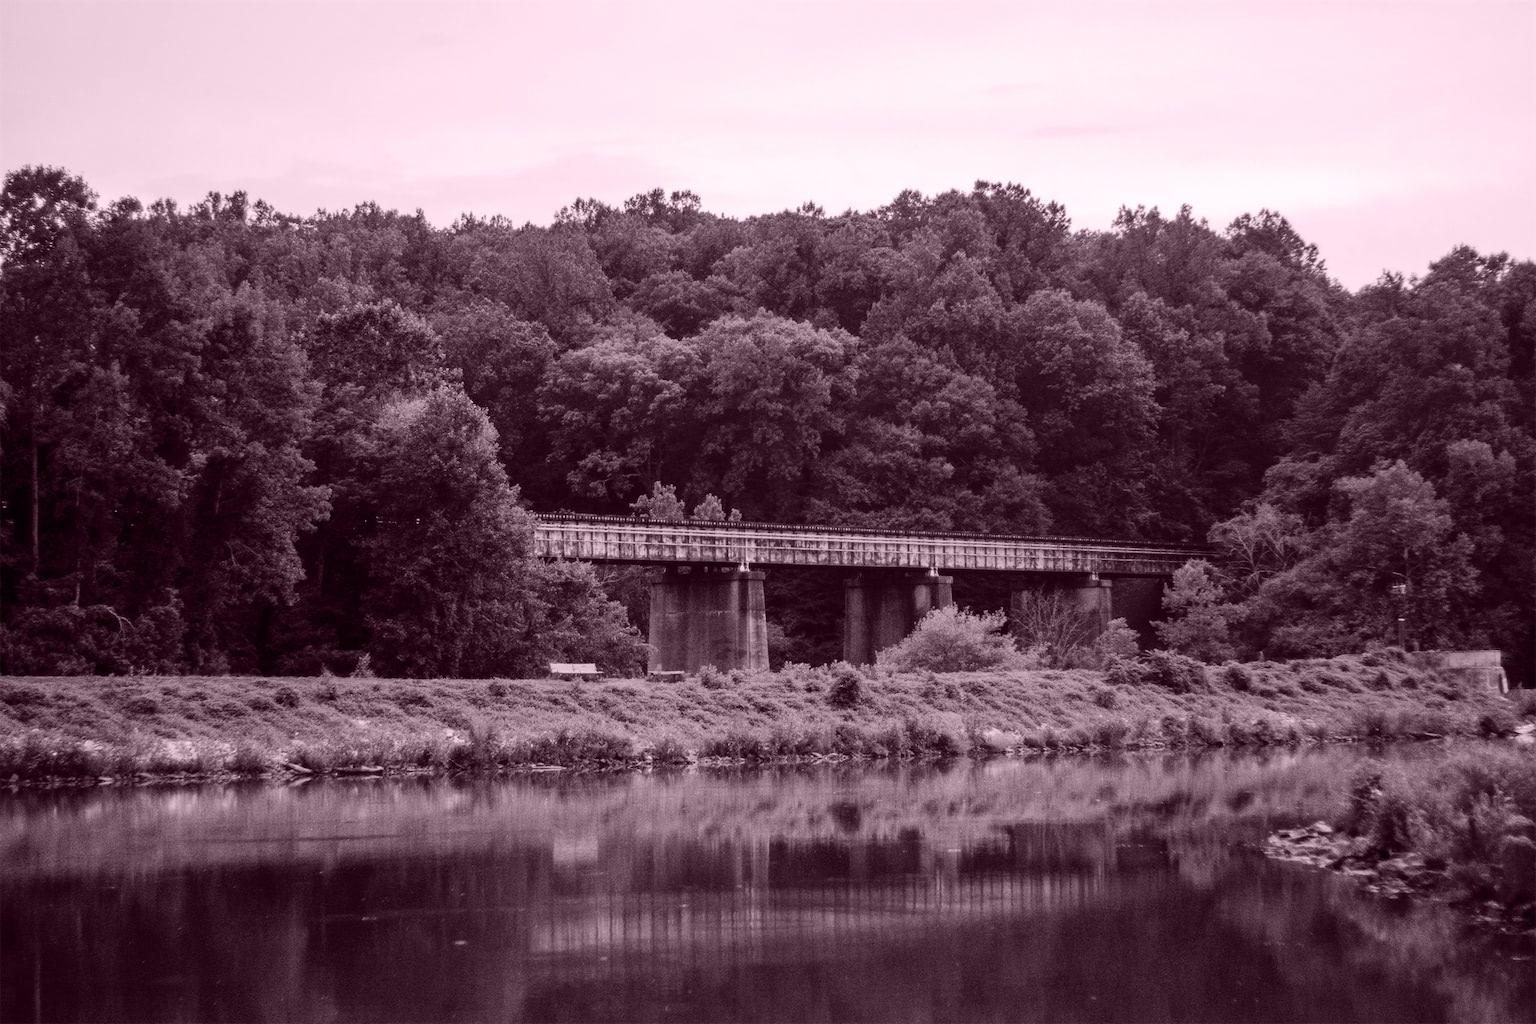 Amtrak bridge surrounded by foliage at Lake Accotink, 2019. Lake Accotink, VA.